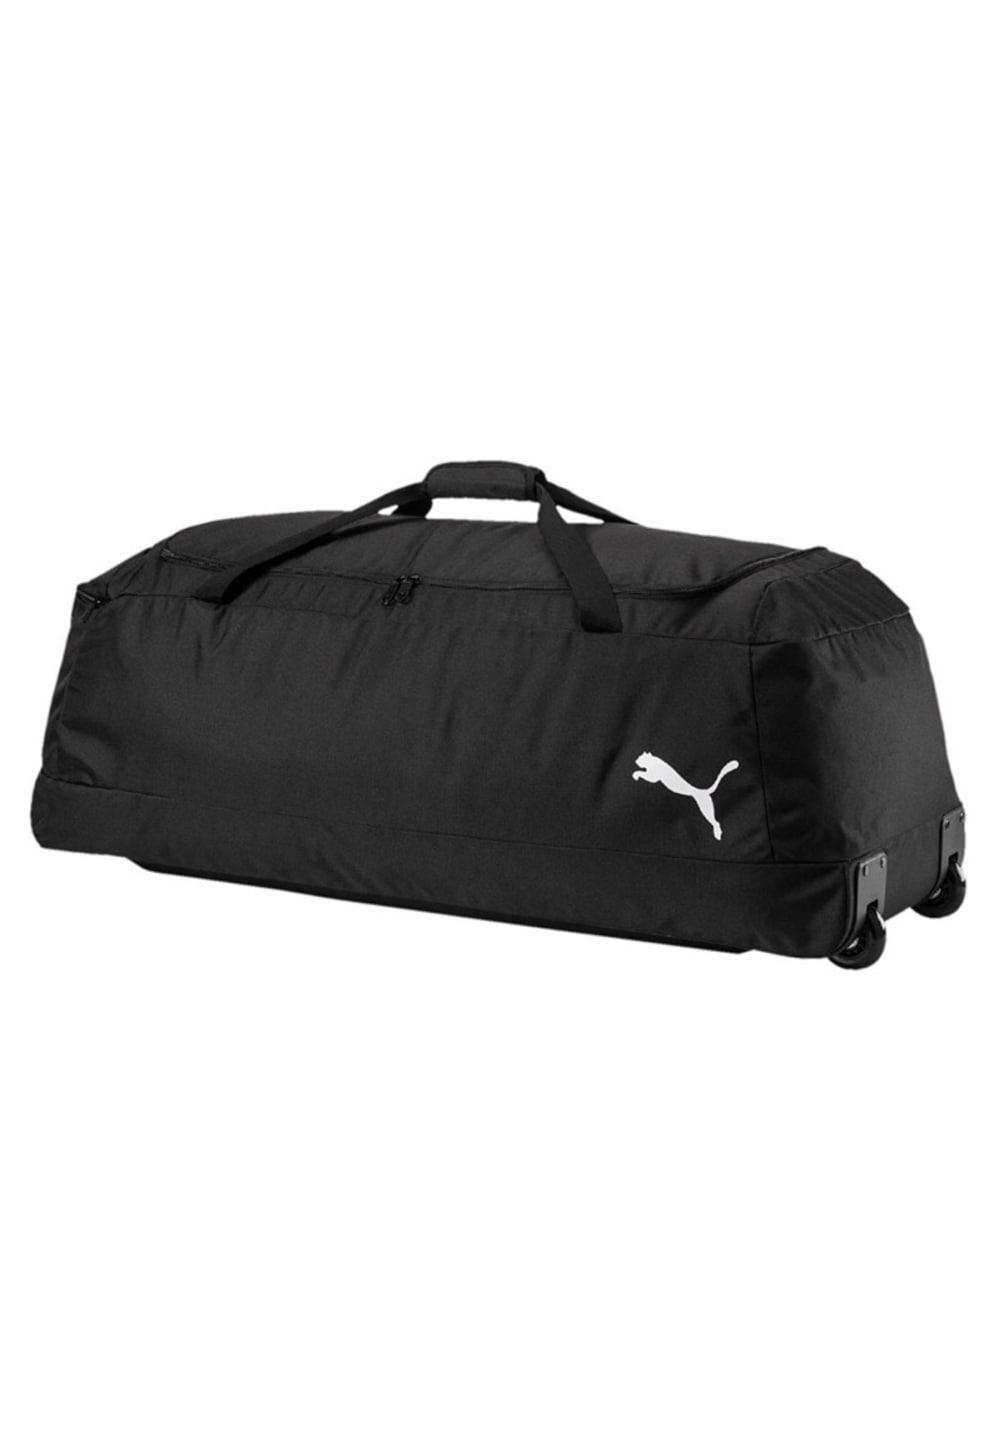 Puma Pro Training II Xlarge Wheel Bag Sporttaschen - Schwarz, Gr. One Size